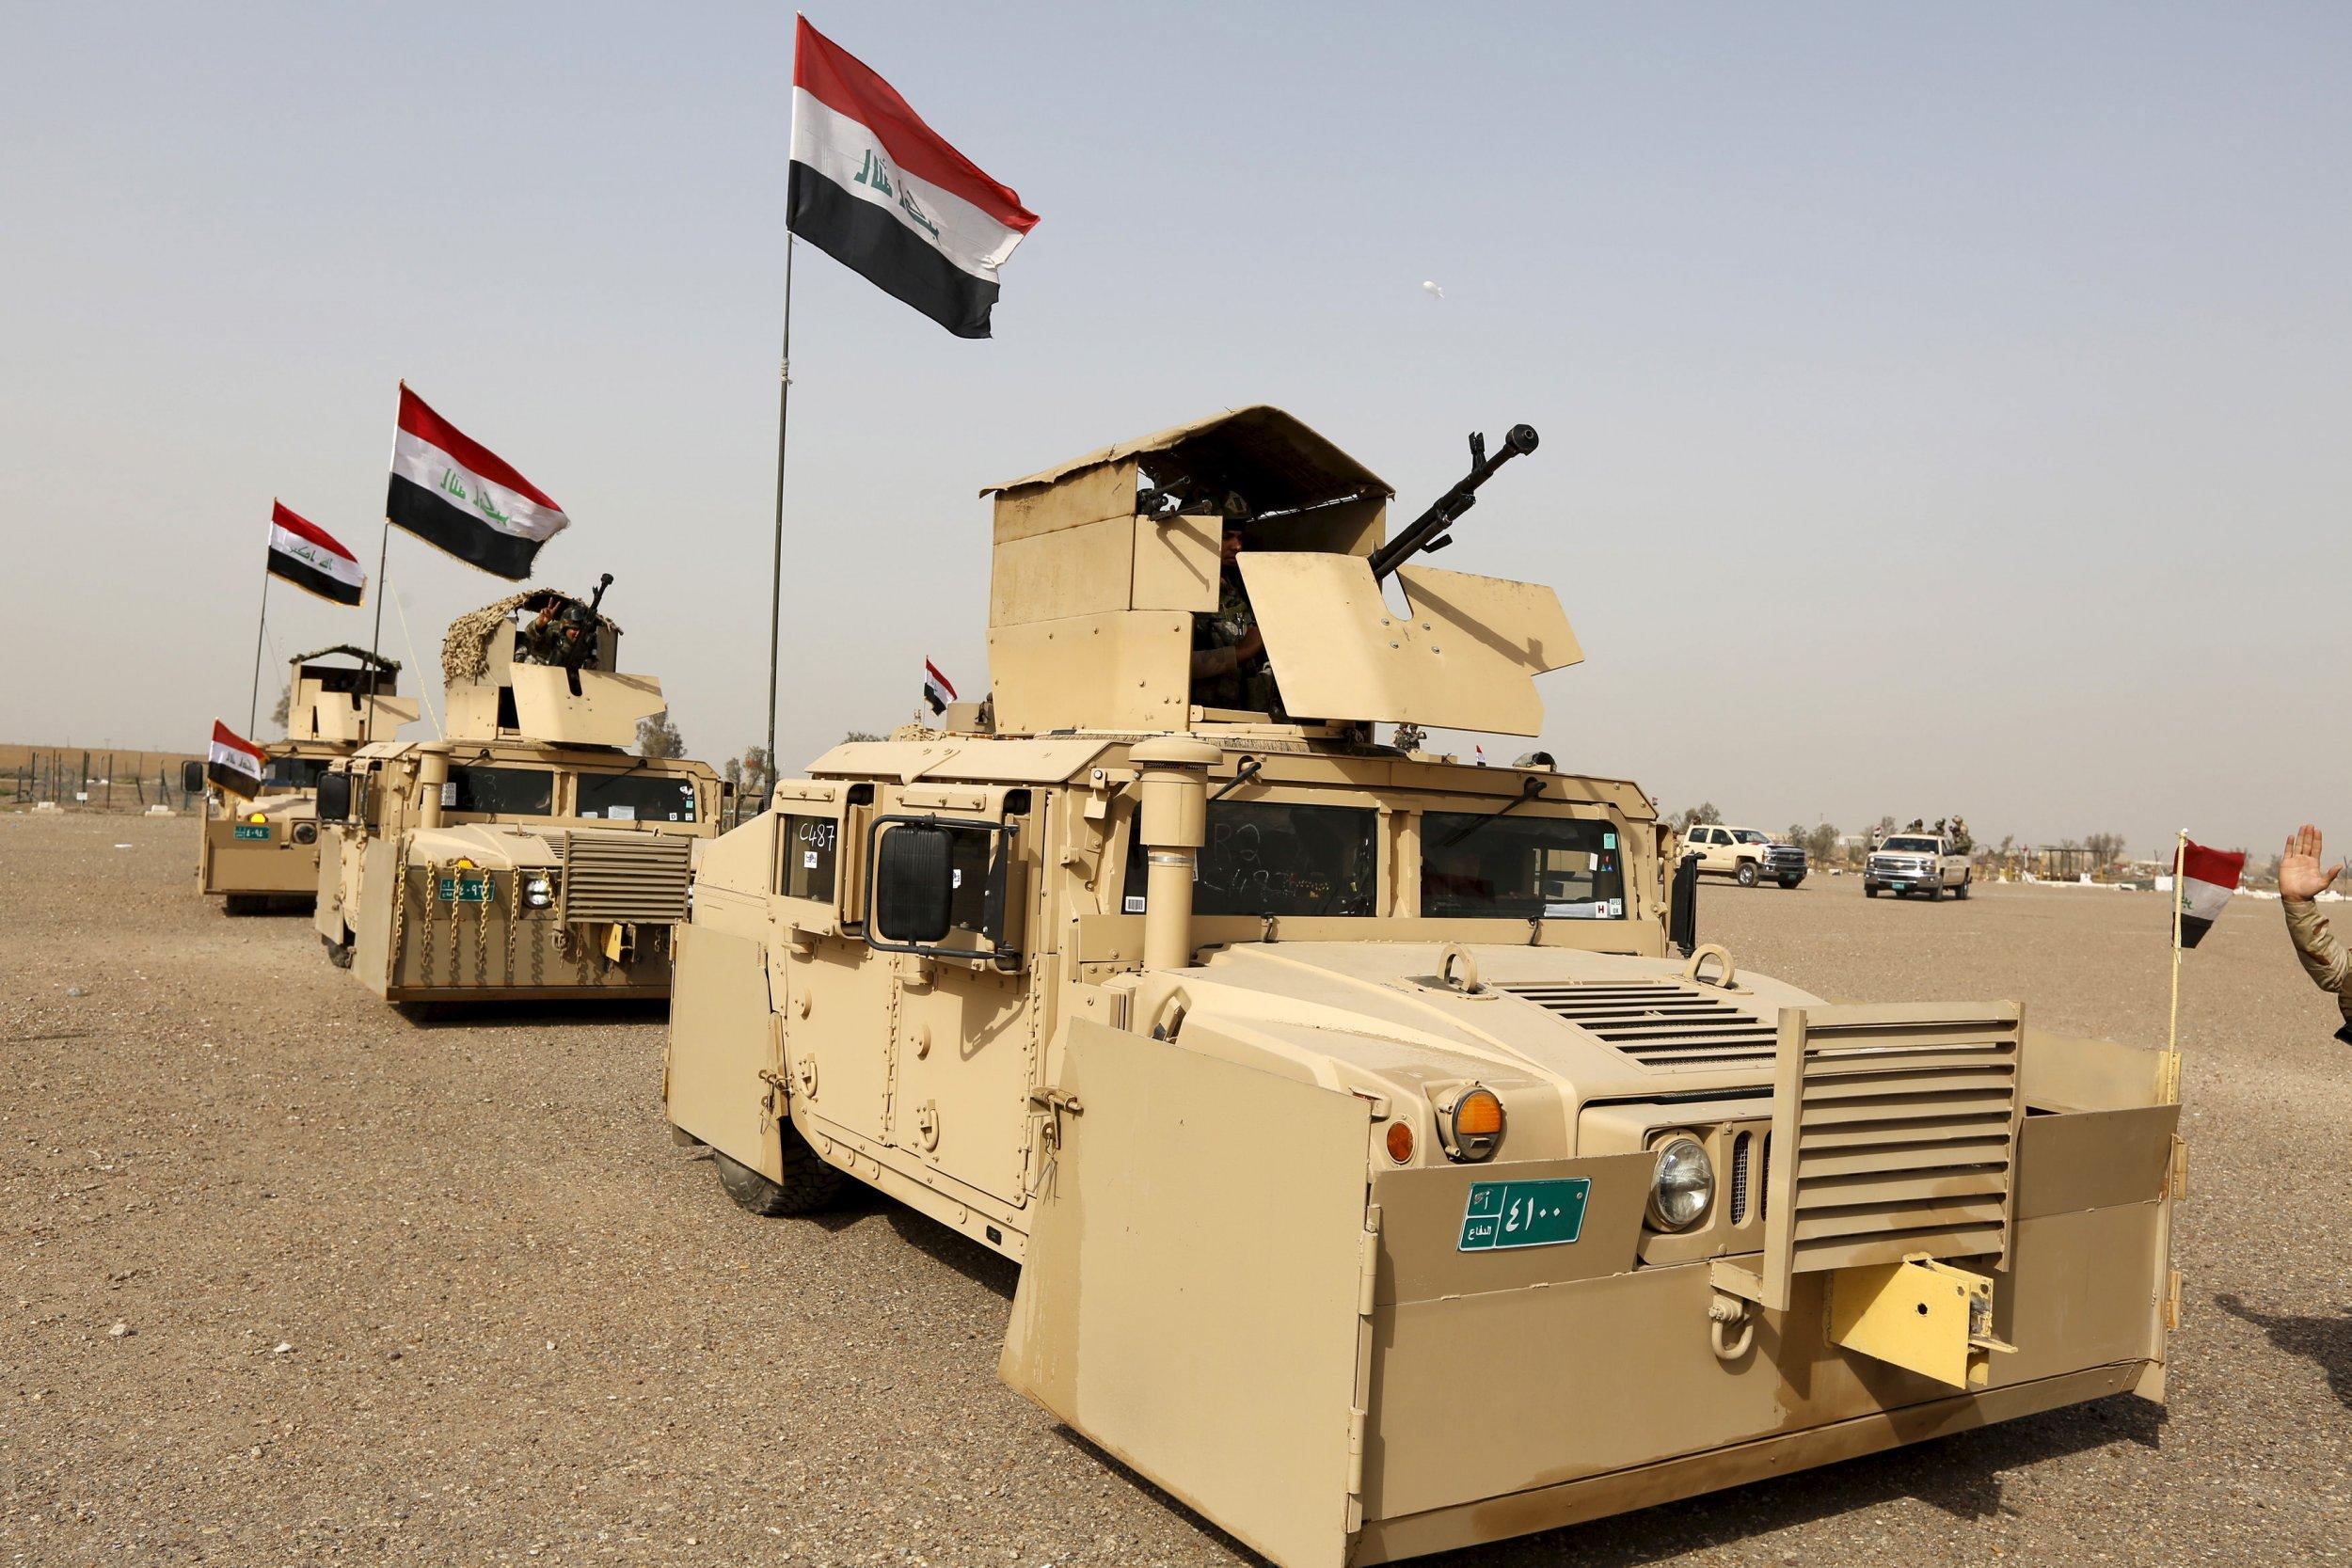 isis_iraq_bombing_civilians_0310